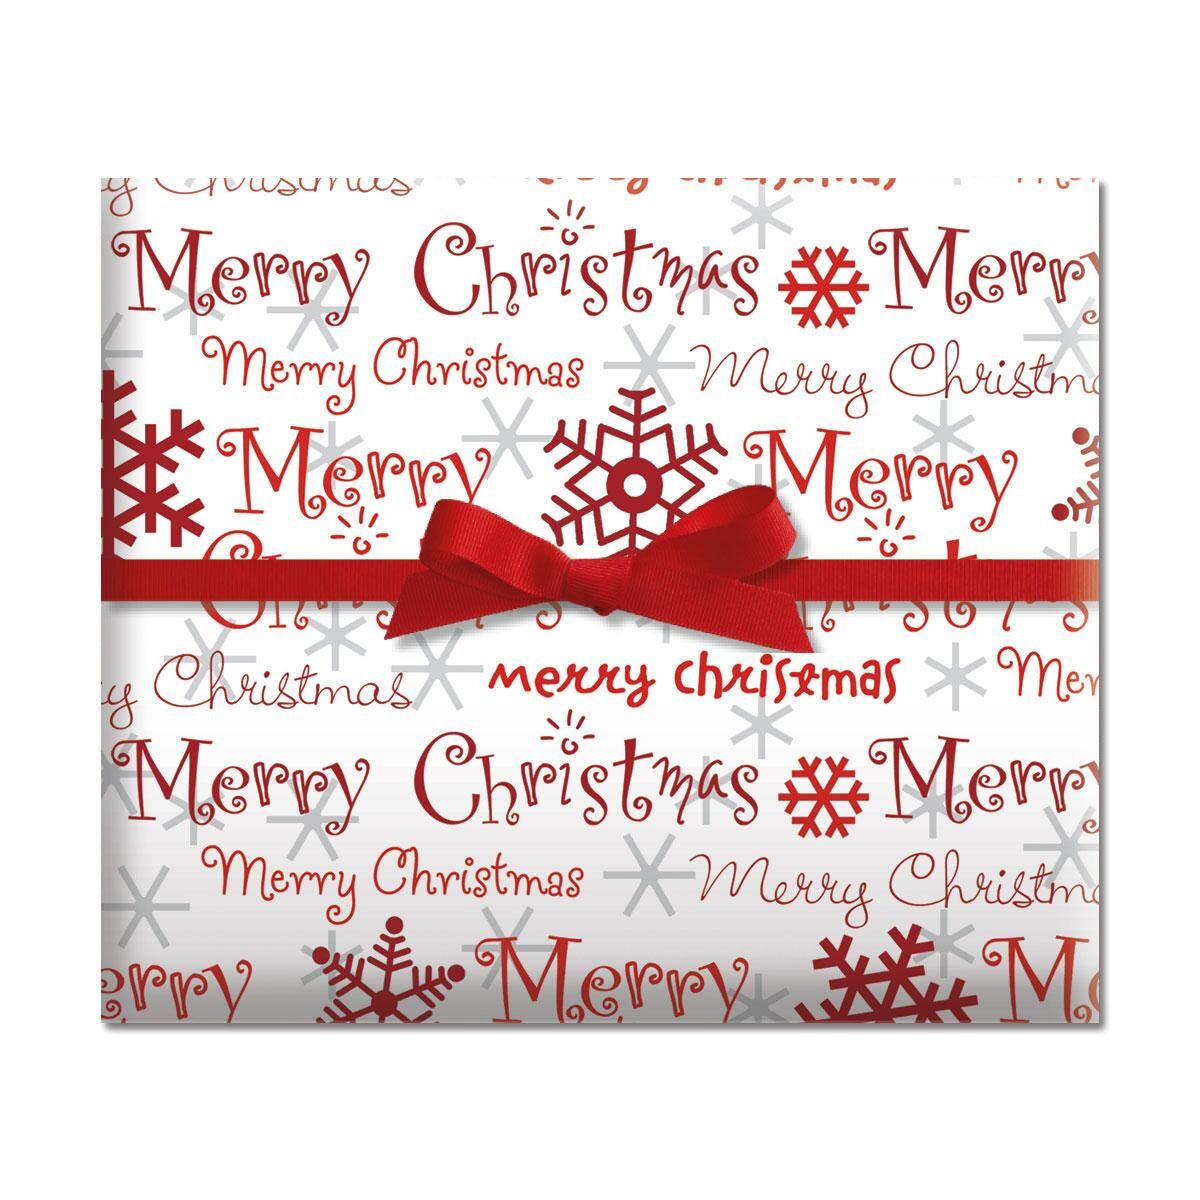 Merry Christmas Script Jumbo Rolled Gift Wrap